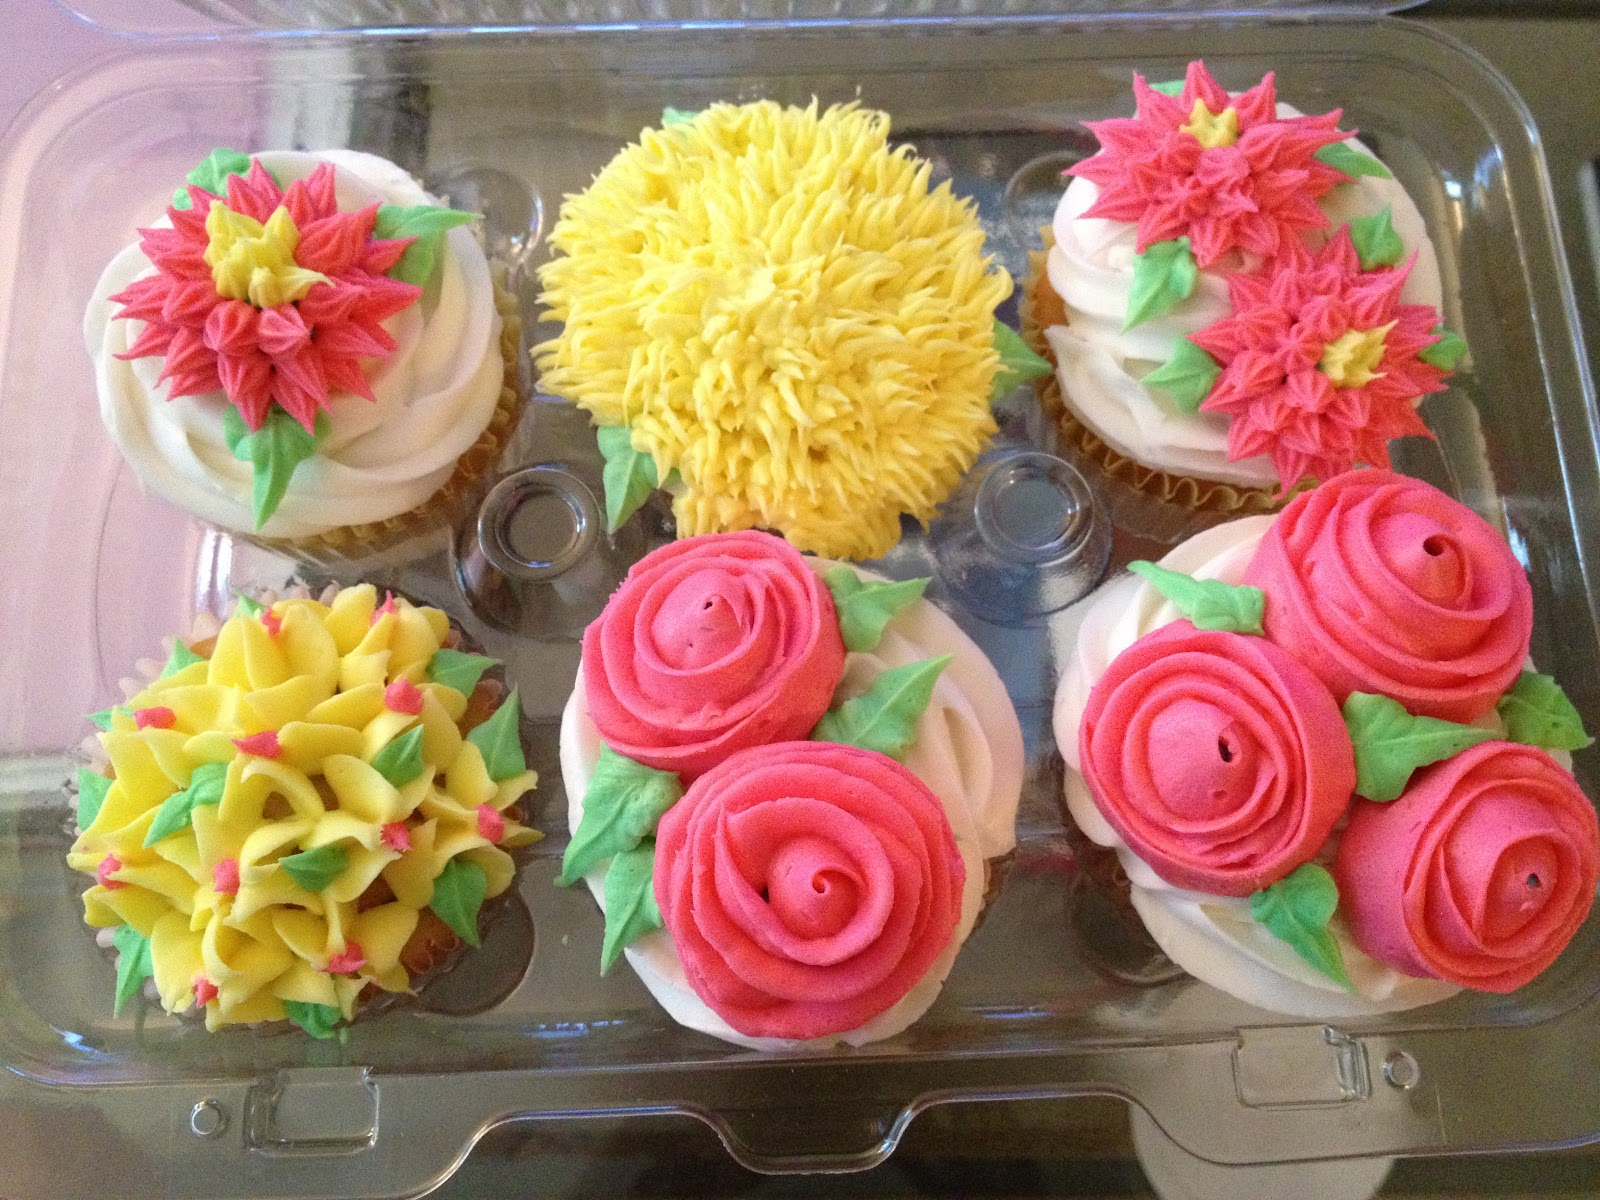 Cake Decorating Class Kl : Little Ms. Piggys: Class: Cake Decorating Basics (Class #3)